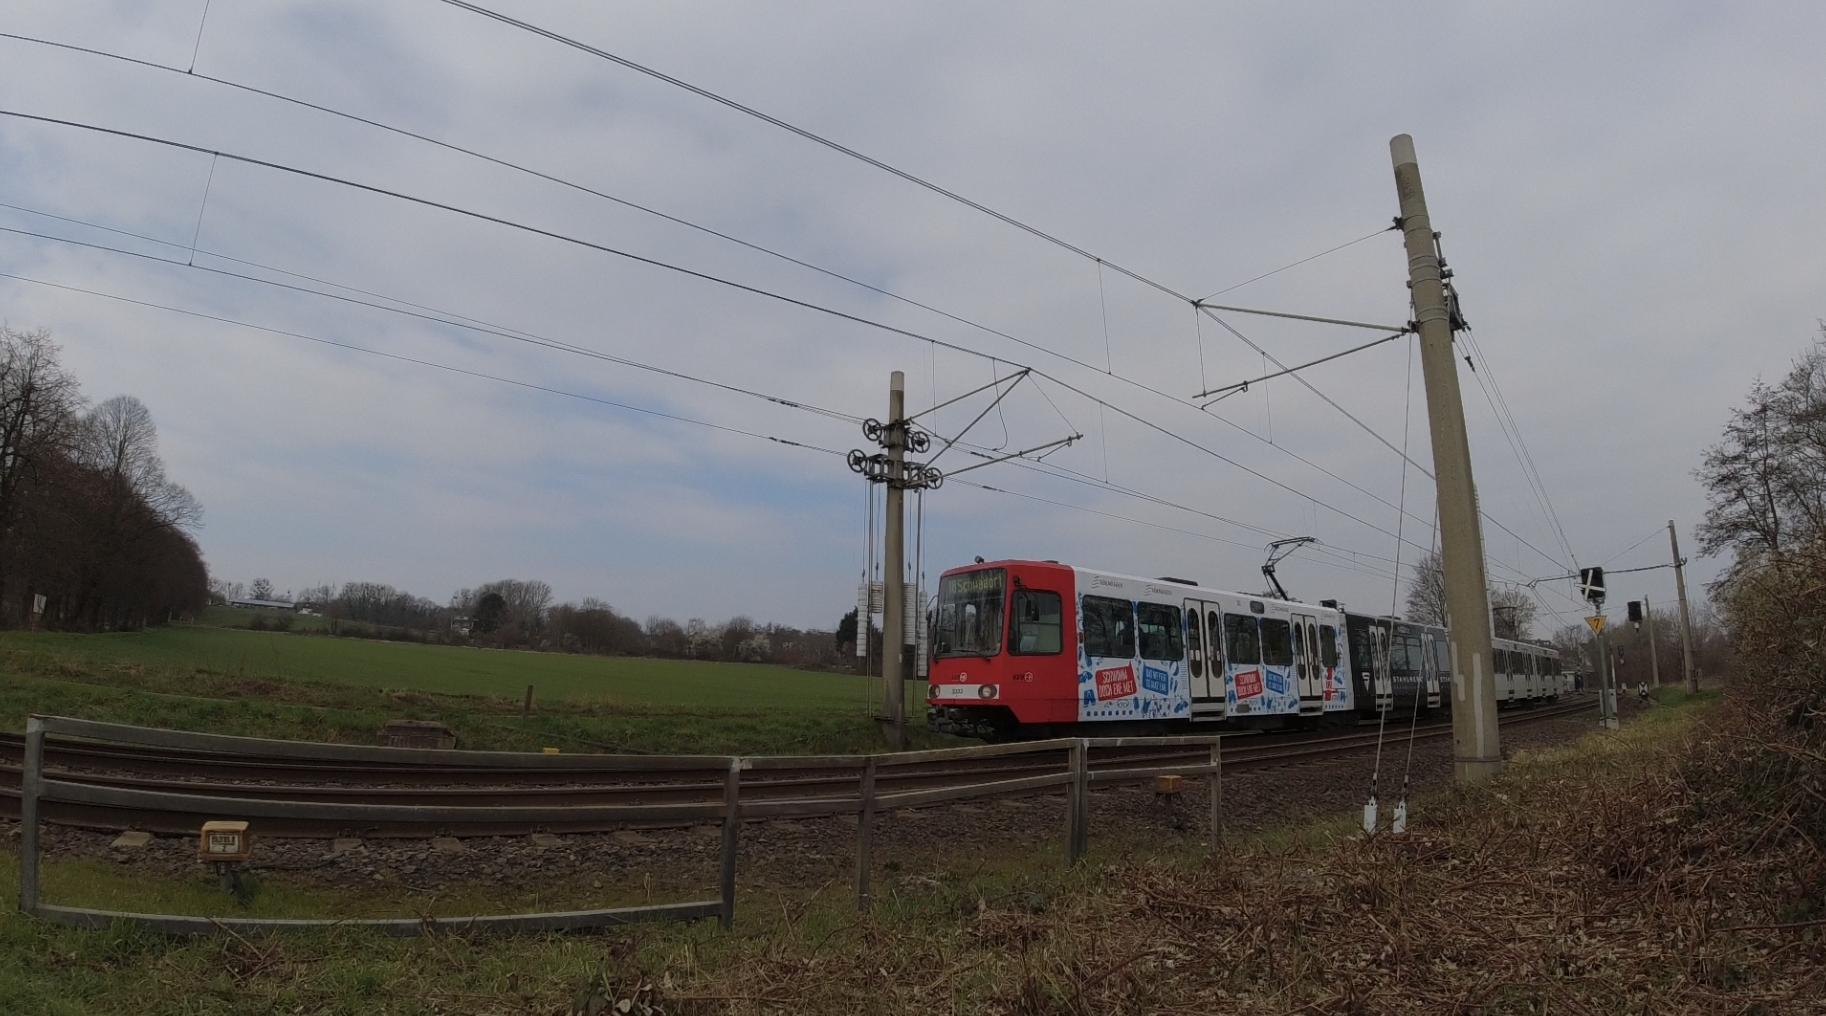 #Bahn, #Bahnübergang, #Schranke, #RoteAmpel, #SBahn, #Stadtbahn, #Lokomotive, #Diesel, #Rommerskirchen, #Brühl, #Hürth,